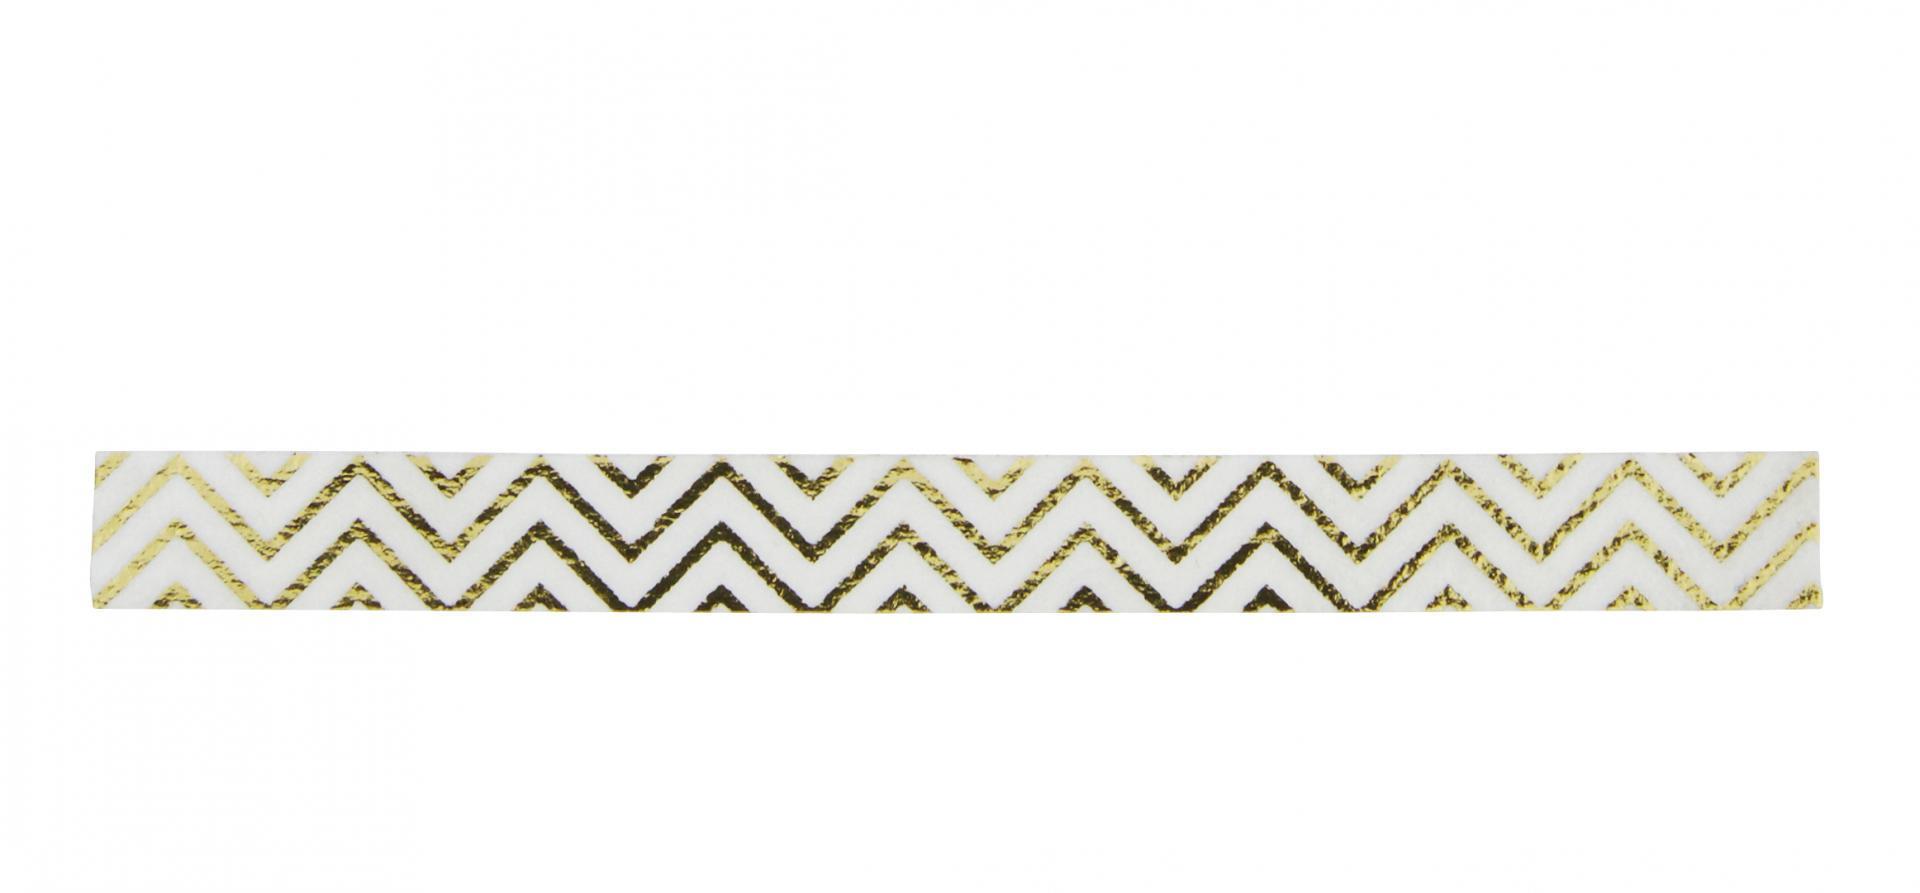 Madam Stoltz Designová samolepicí páska ZigZag Gold, bílá barva, zlatá barva, papír